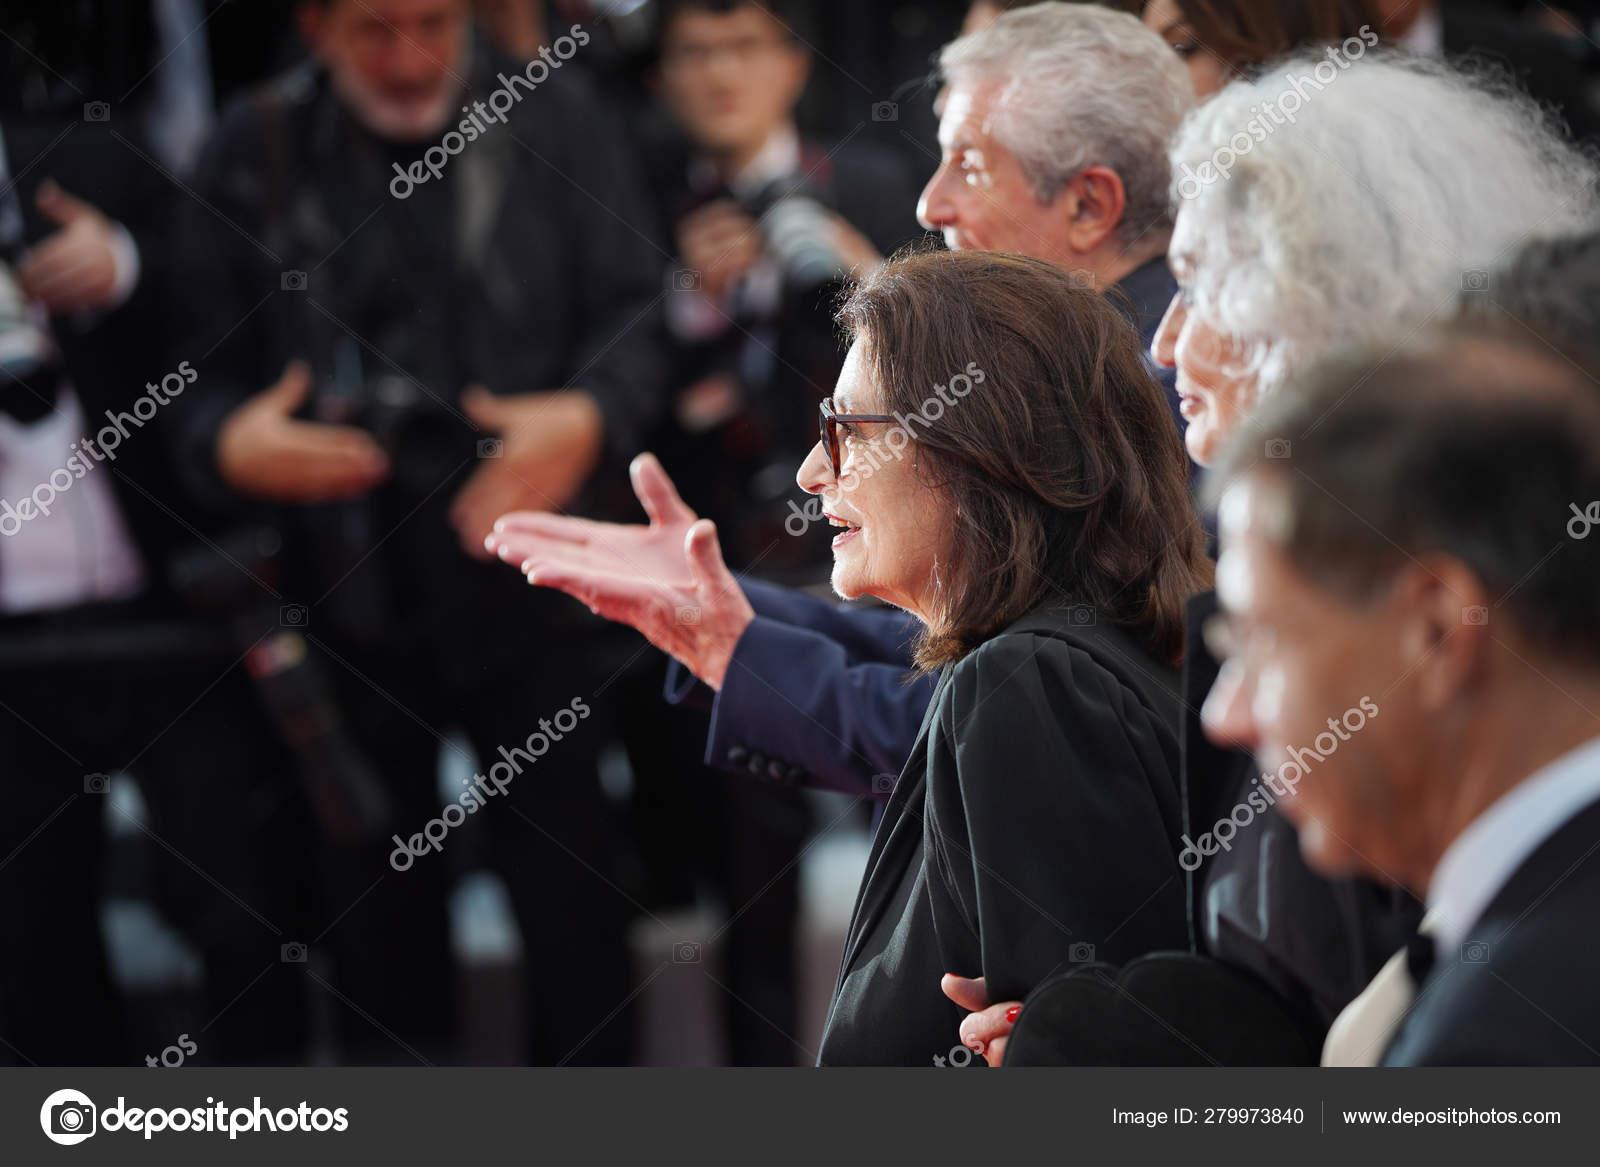 Anouk Aimée Photos anouk aimee, claude lelouch at the gala premiere – stock